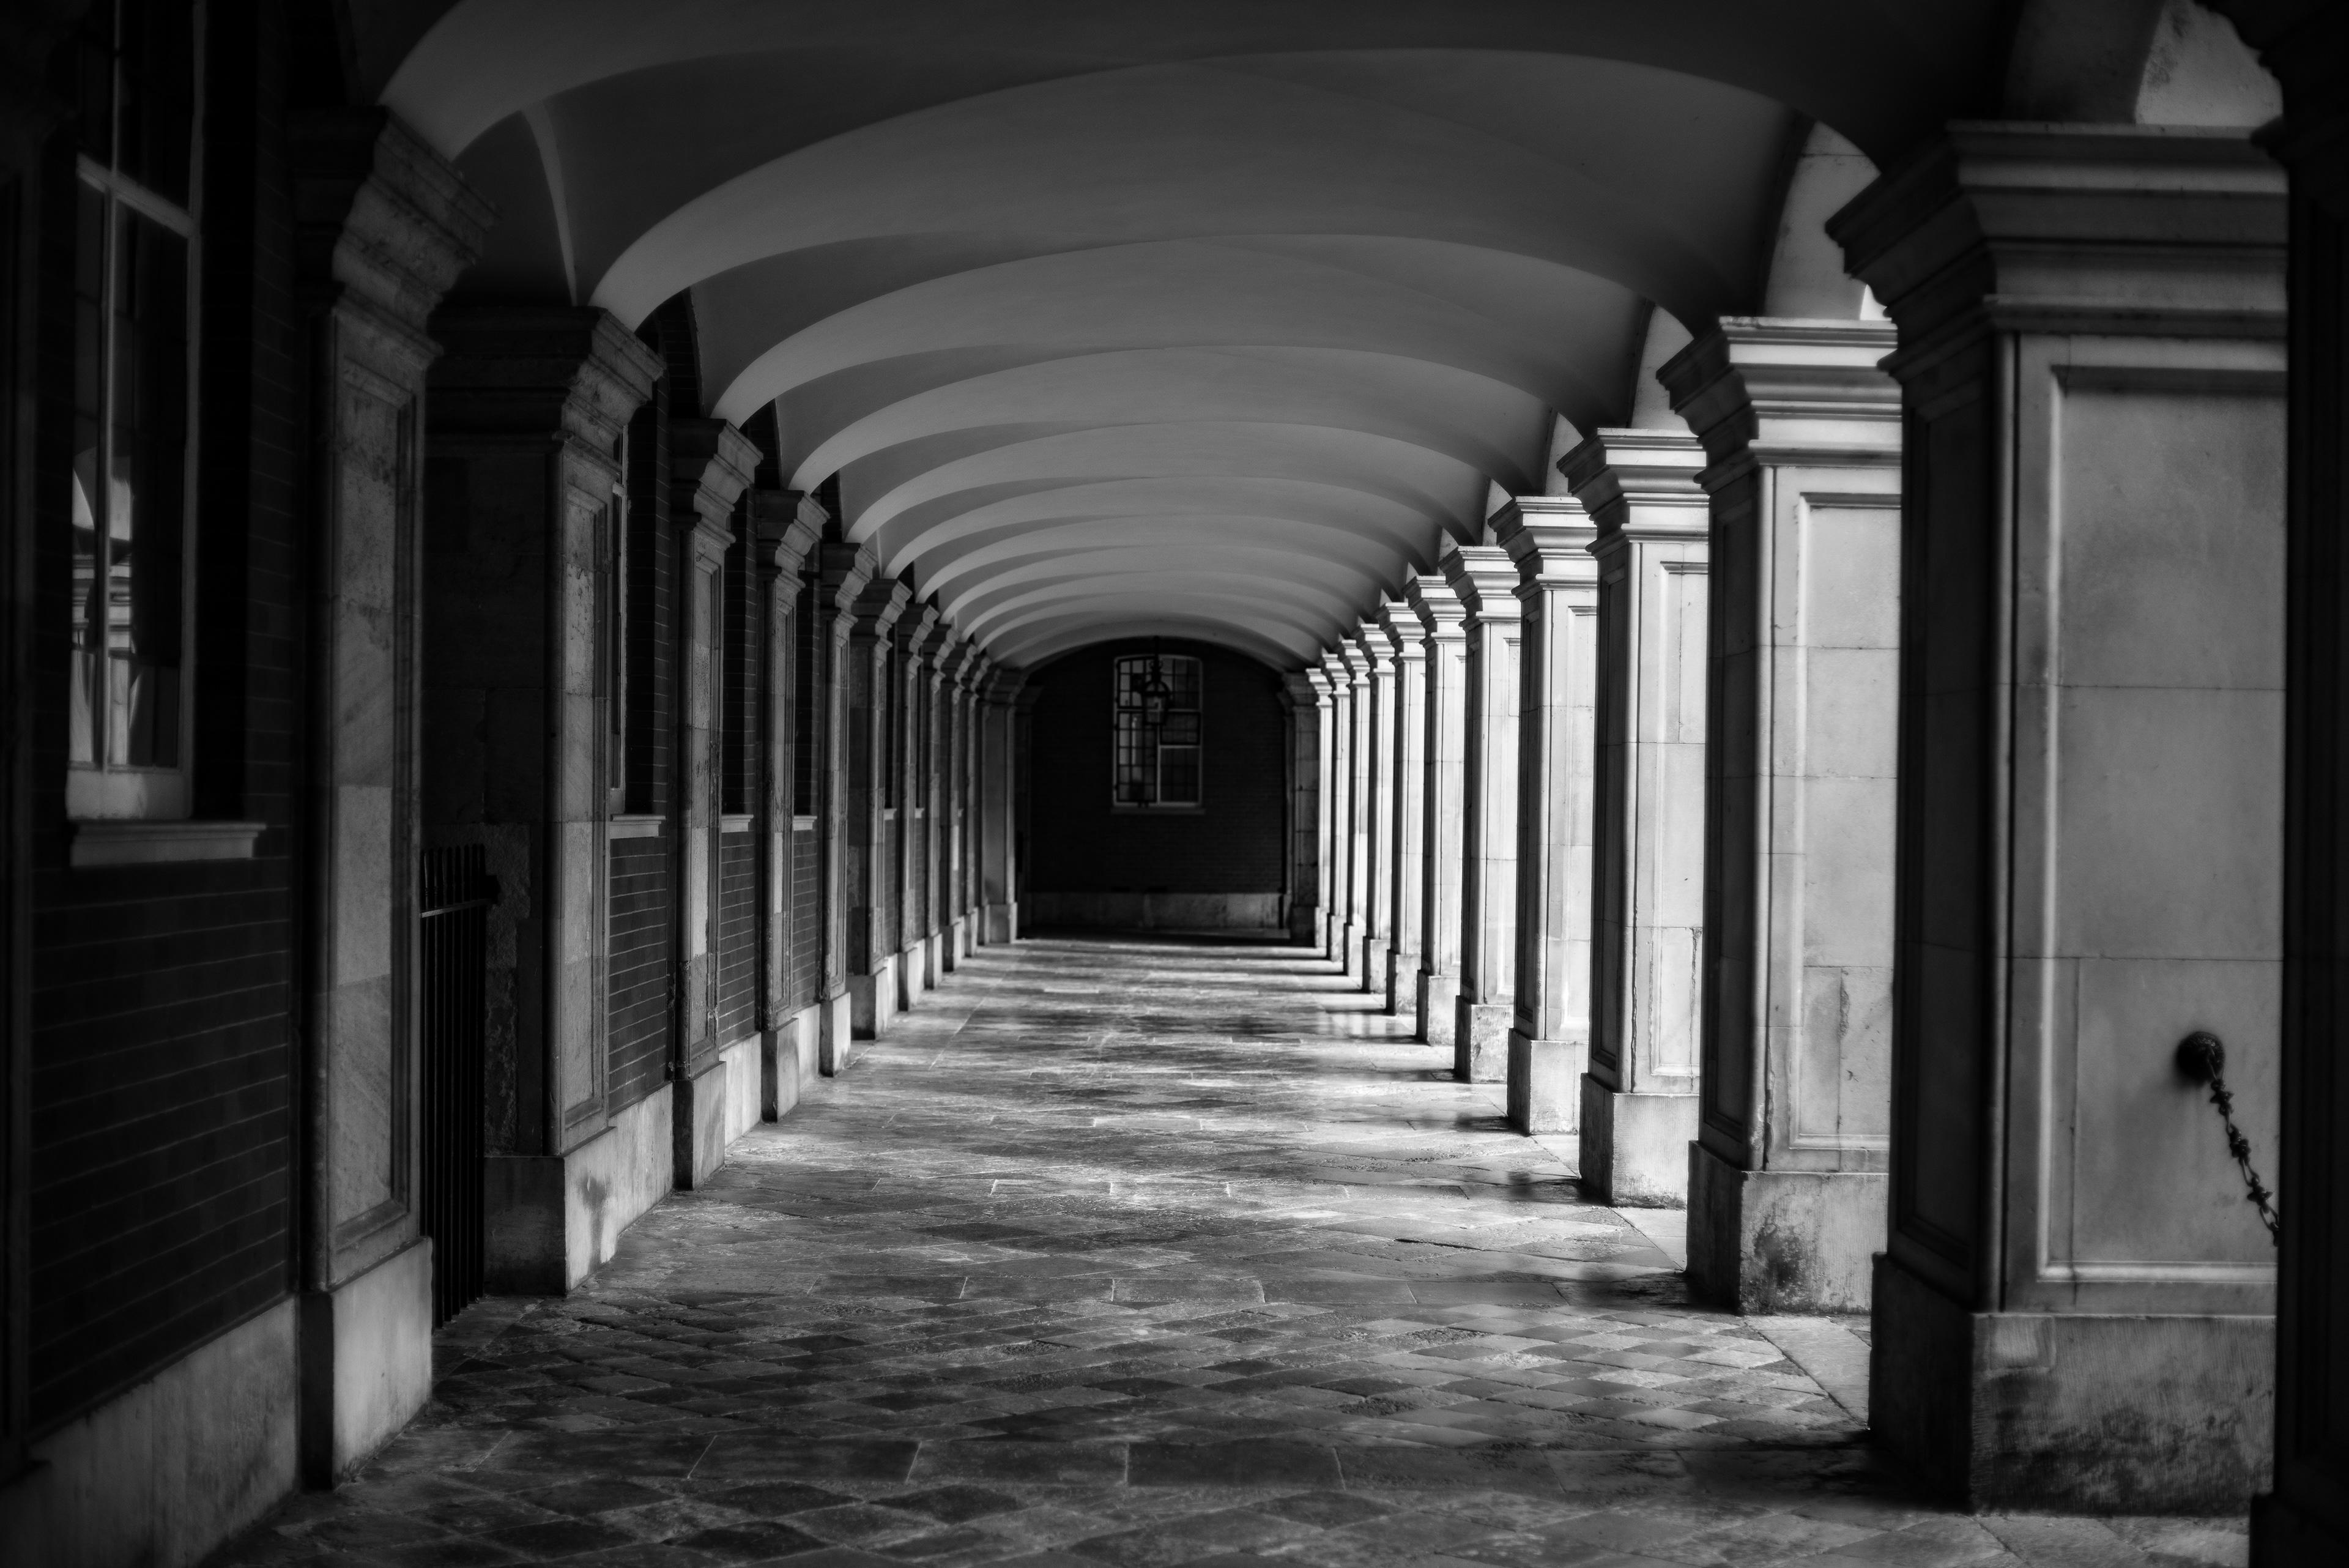 Architecture Photography Dissertation talha malik